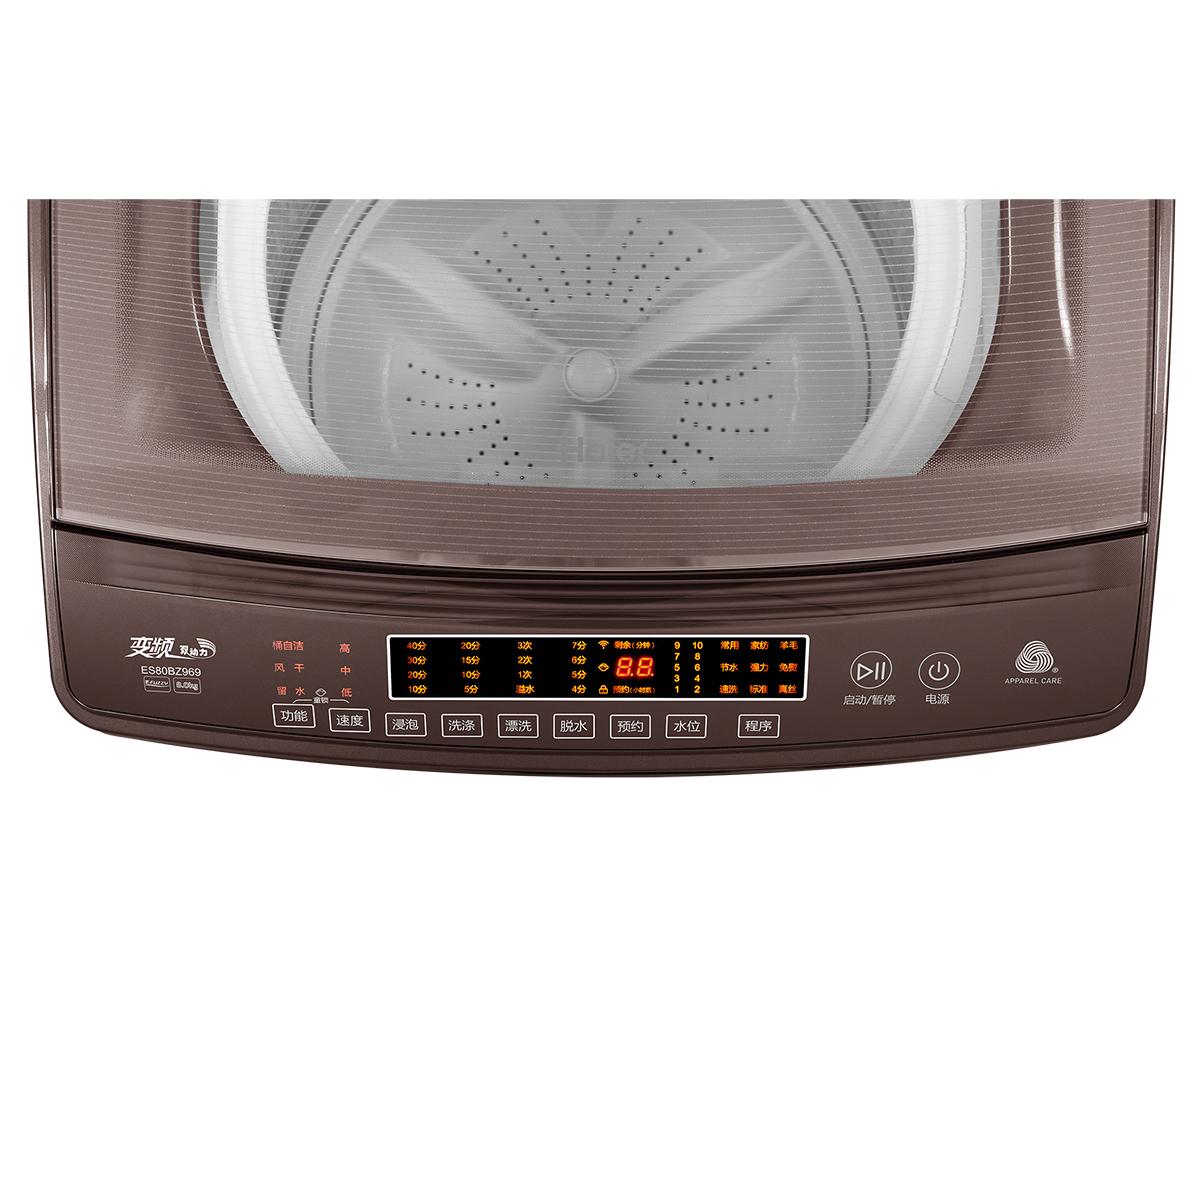 Haier/海尔 波轮洗衣机 ES80BZ969 8公斤变频双动力波轮洗衣机